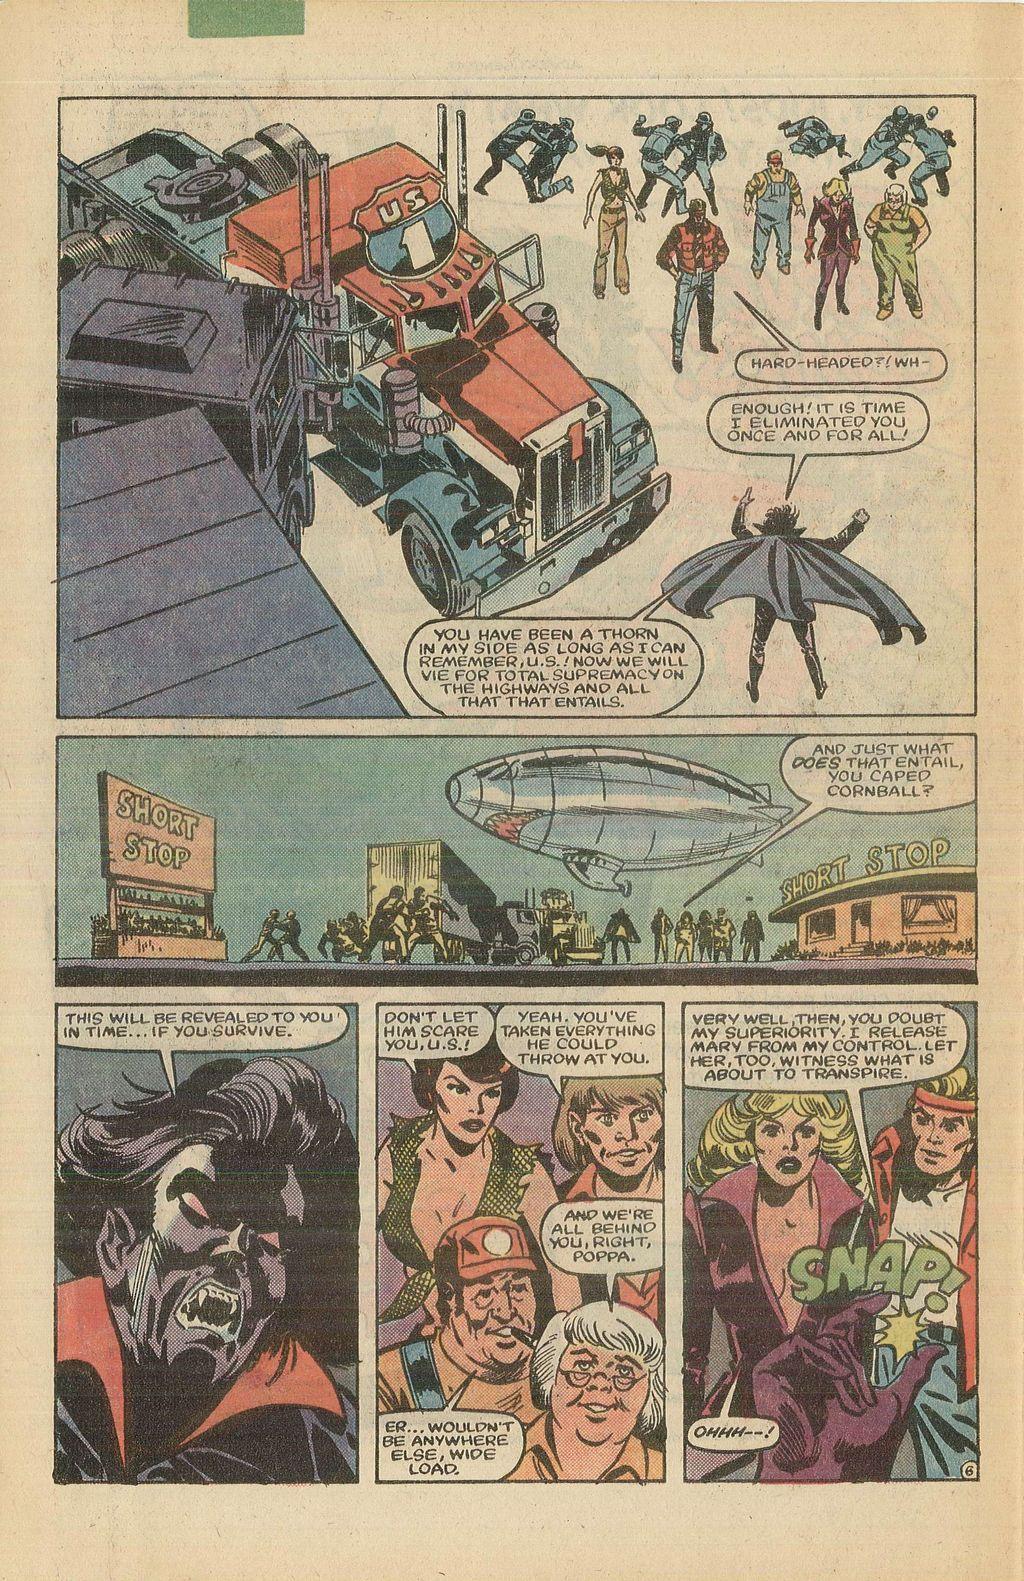 Read online U.S. 1 comic -  Issue #10 - 10